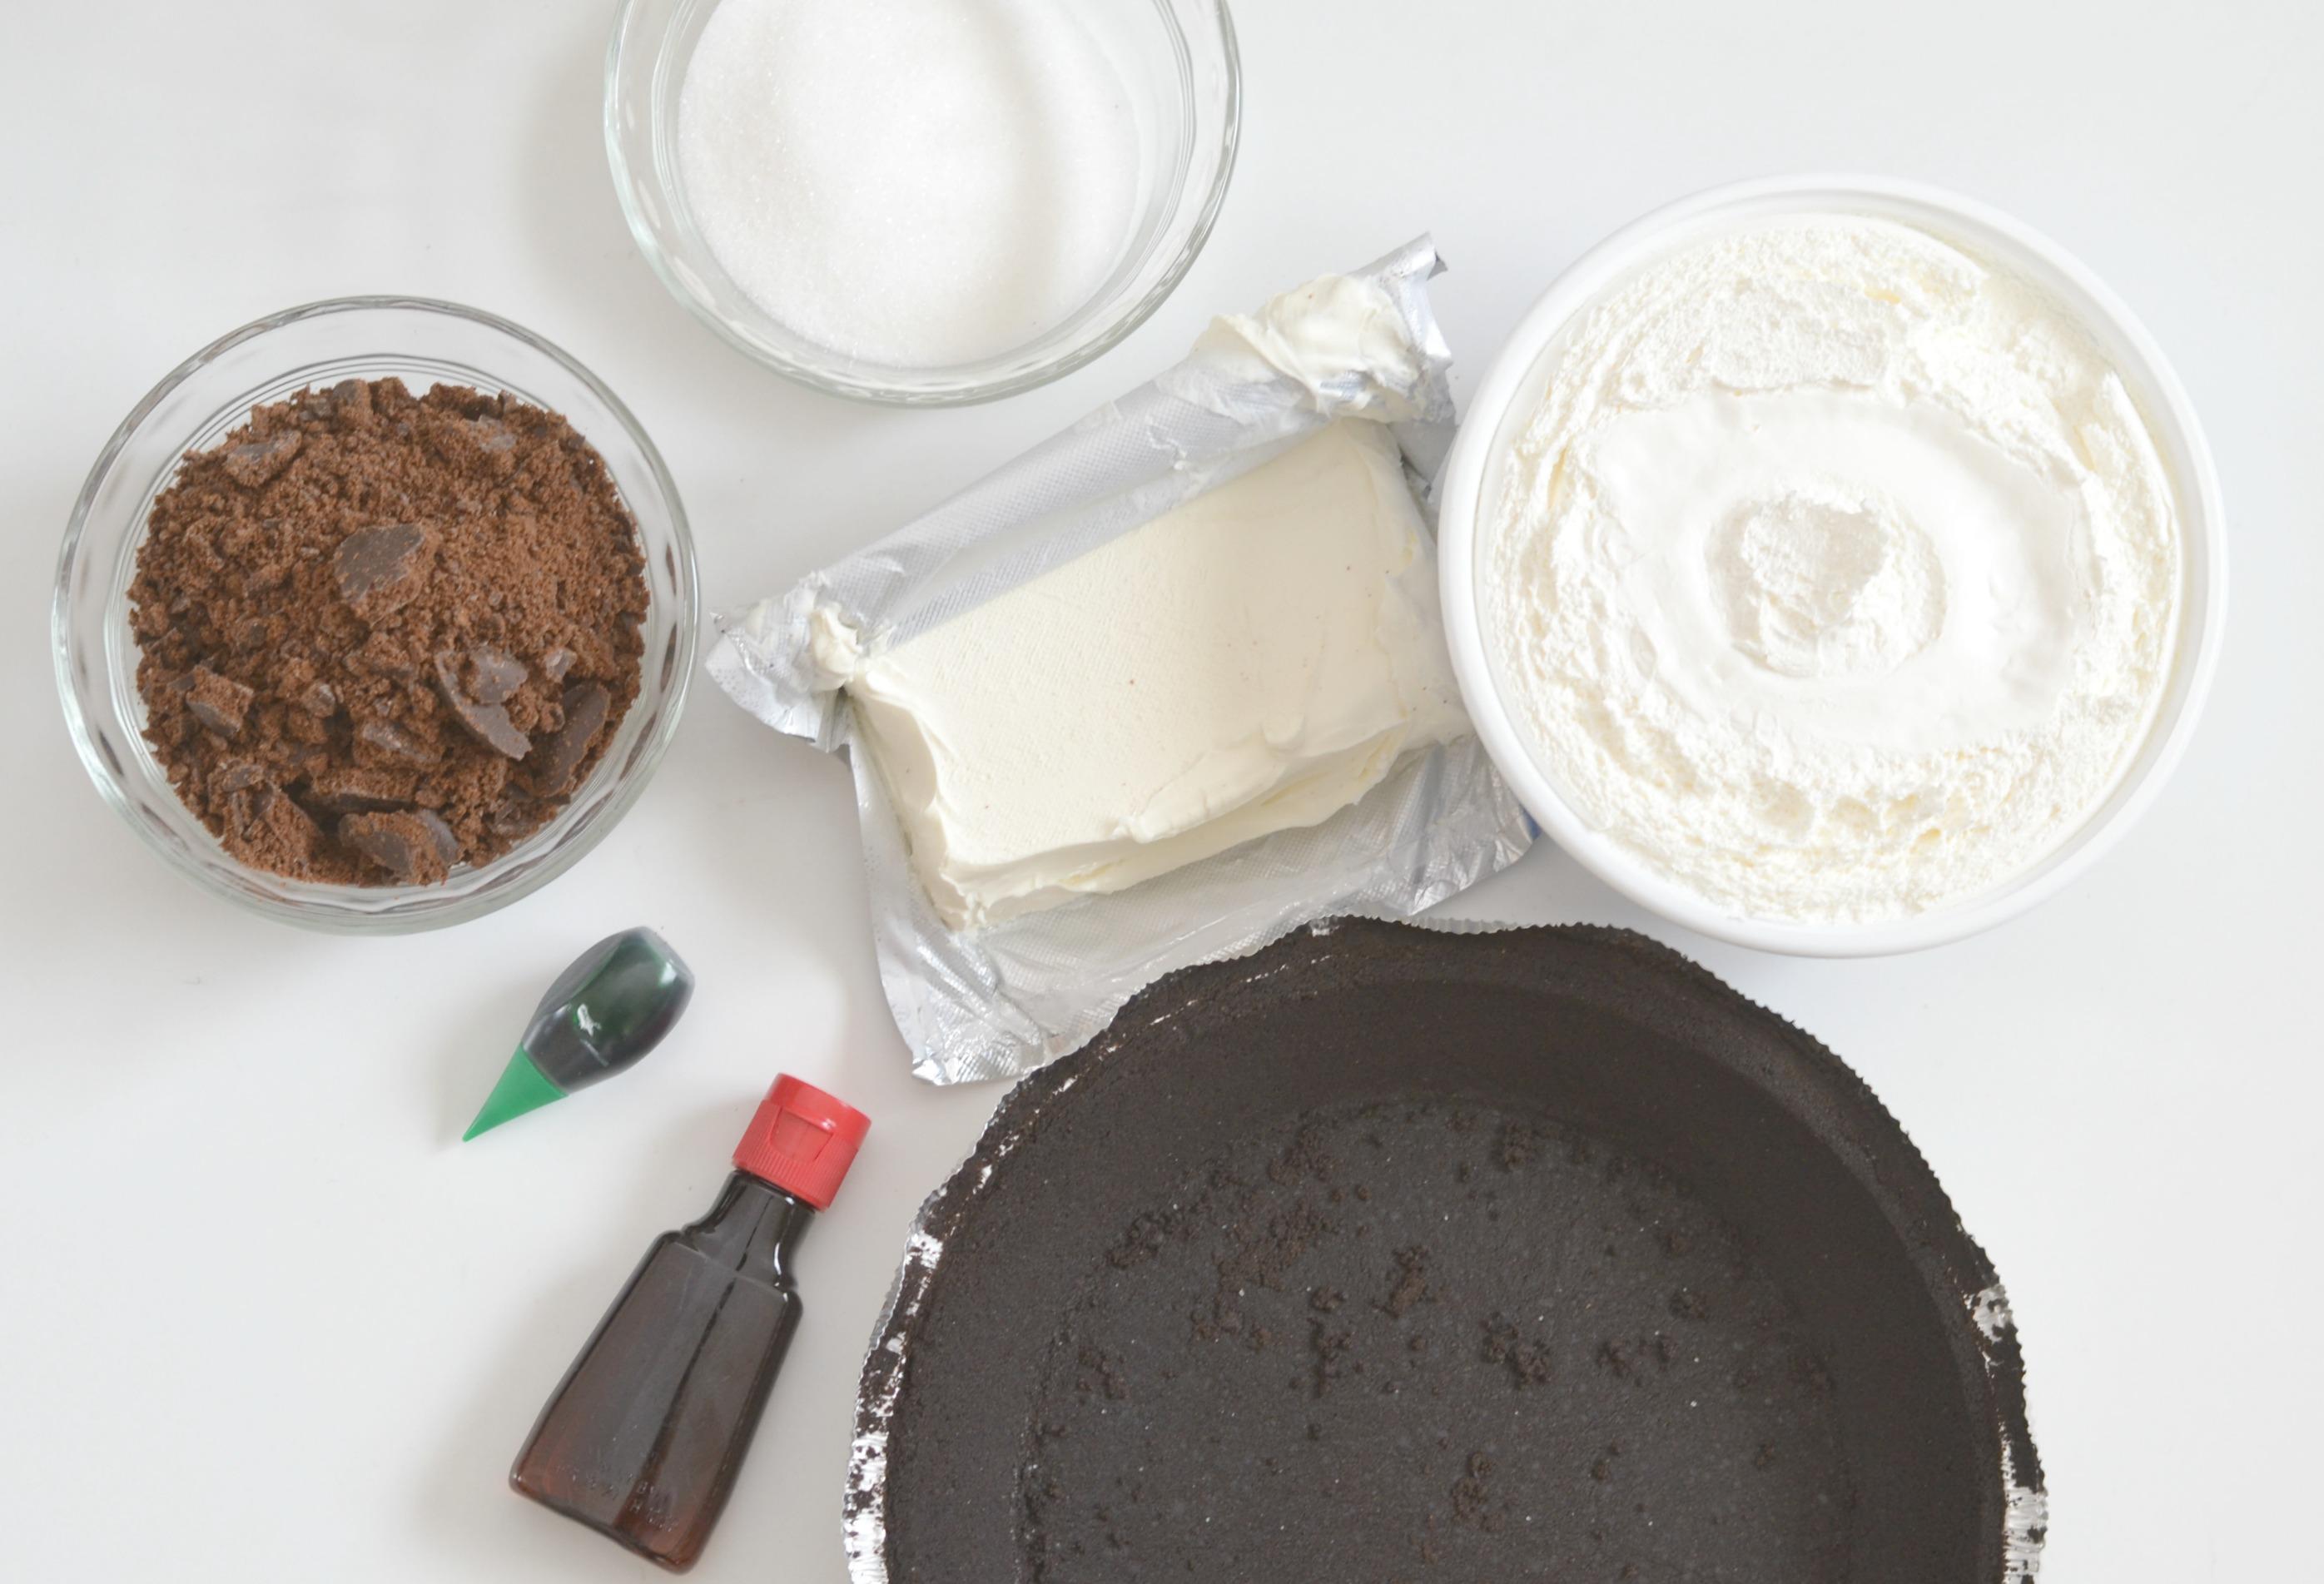 Thin Mint No Bake Cheesecake, easy no bake desserts, no bake cheesecake recipes, thin mint girl scout cookie recipes, using thin mints in recipes, best cheesecake recipes, best no bake dessert recipes